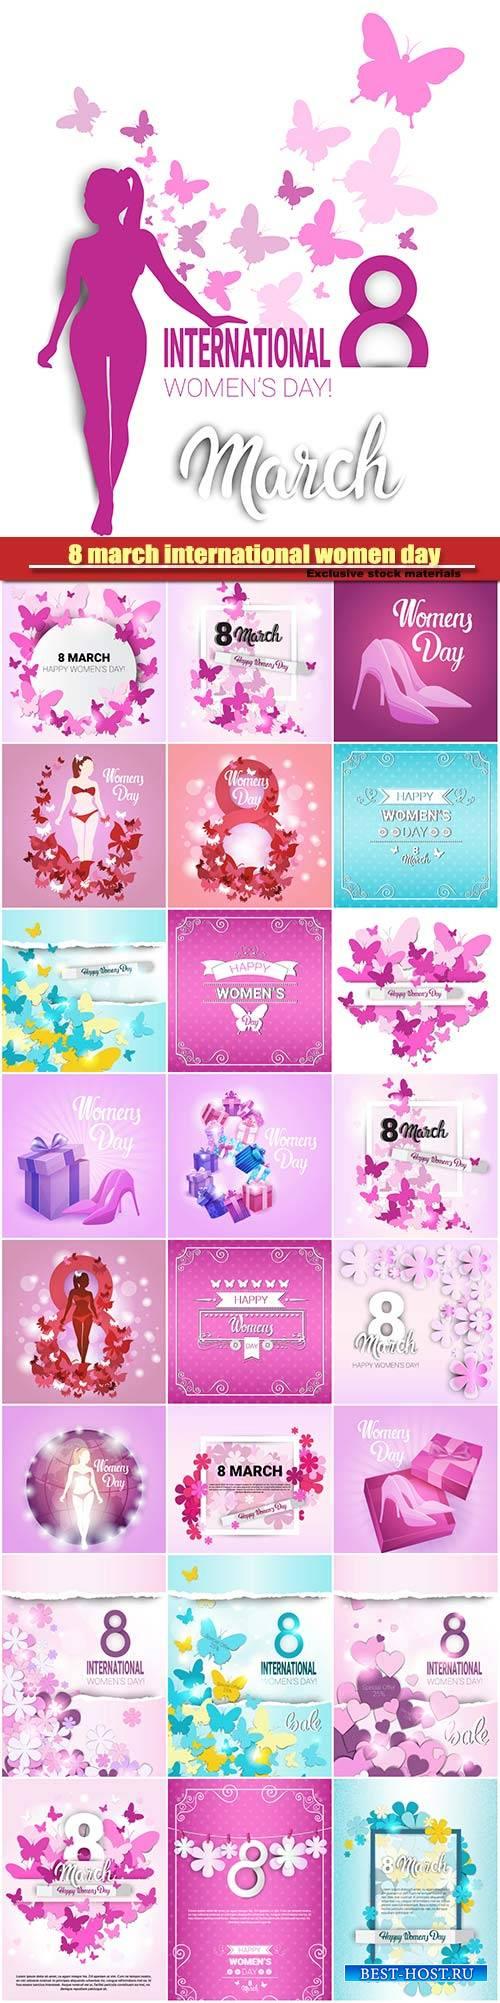 8 march international women day background